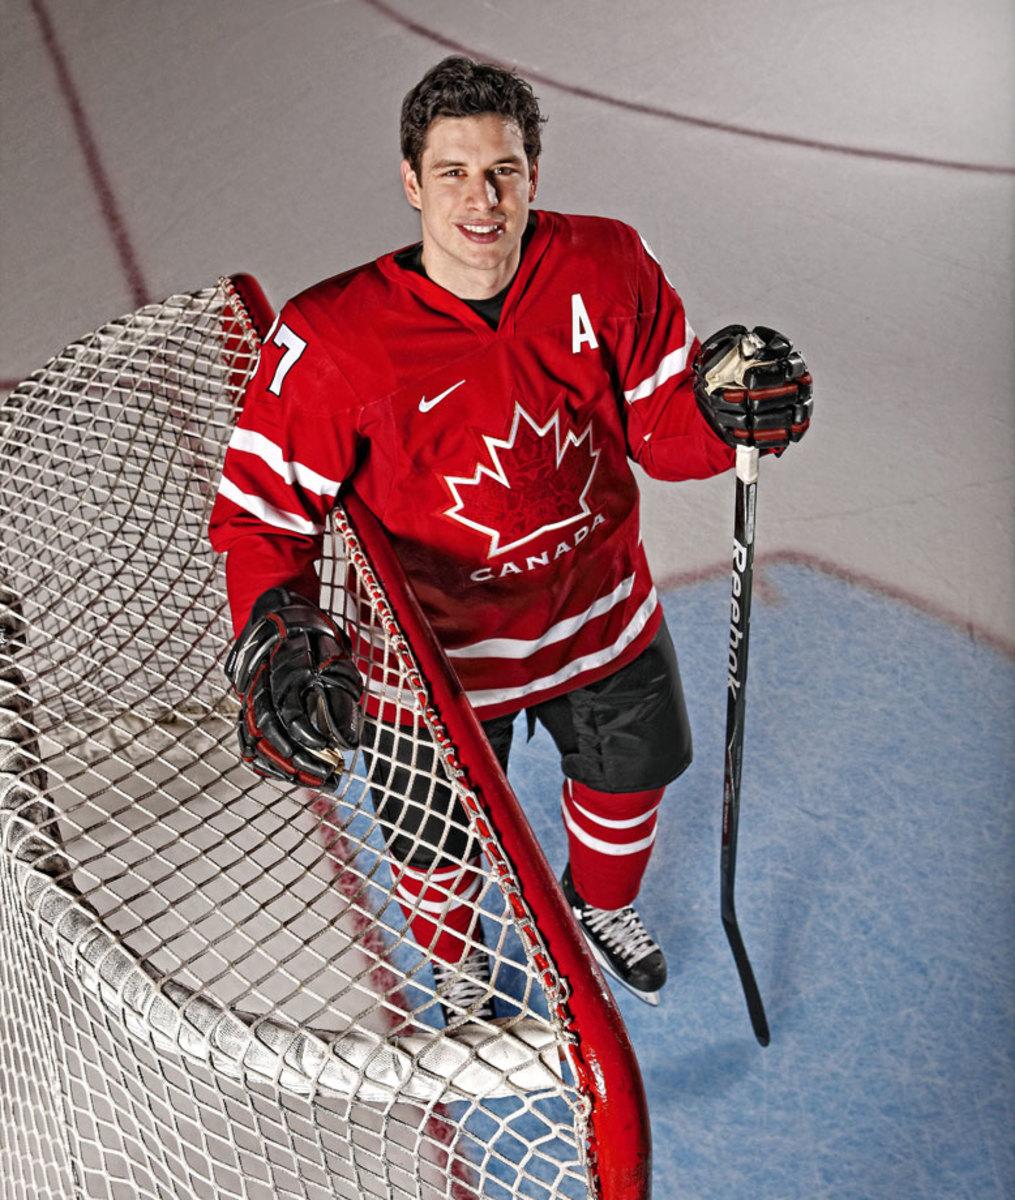 2010-Sidney-Crosby-077558326.jpg